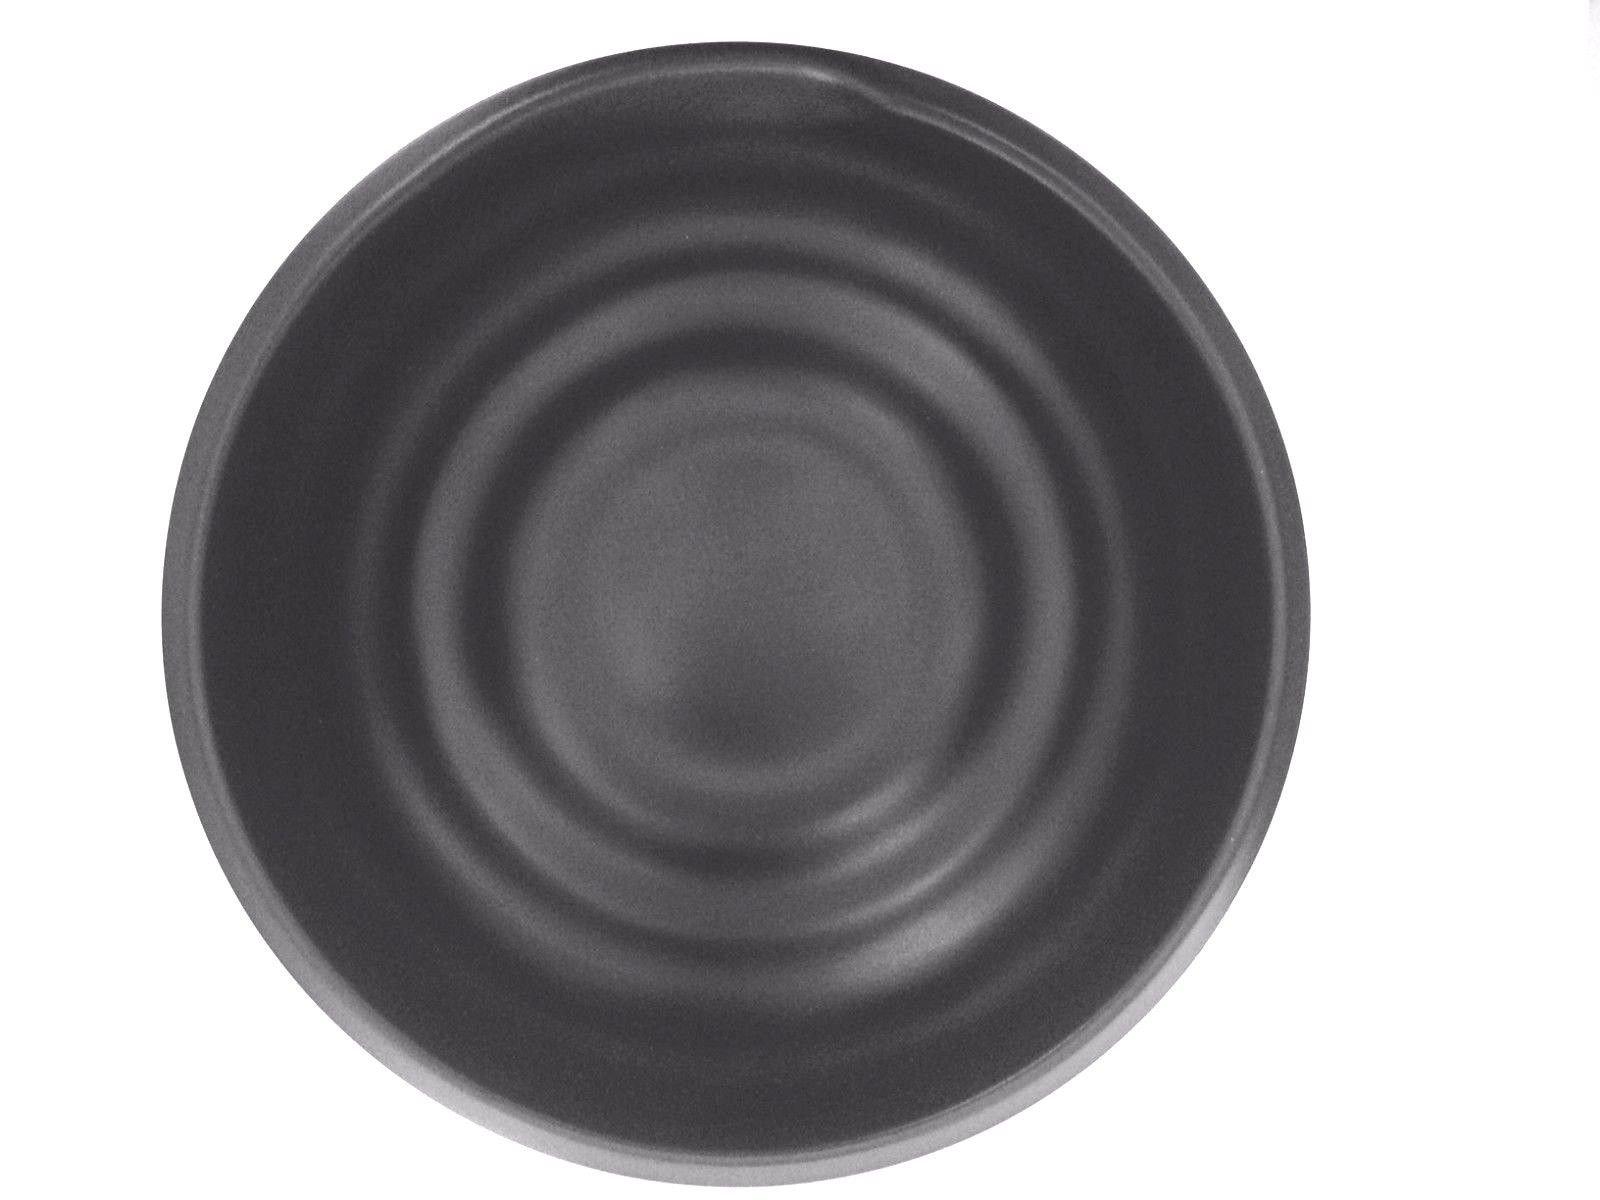 Lucky Star Melamine Round Bowls Ramen Pho Noodle Soup Wonton Soup Bowl, 8.75'' (56 oz), Black, Swirl Shaped (24) by Lucky Star (Image #1)